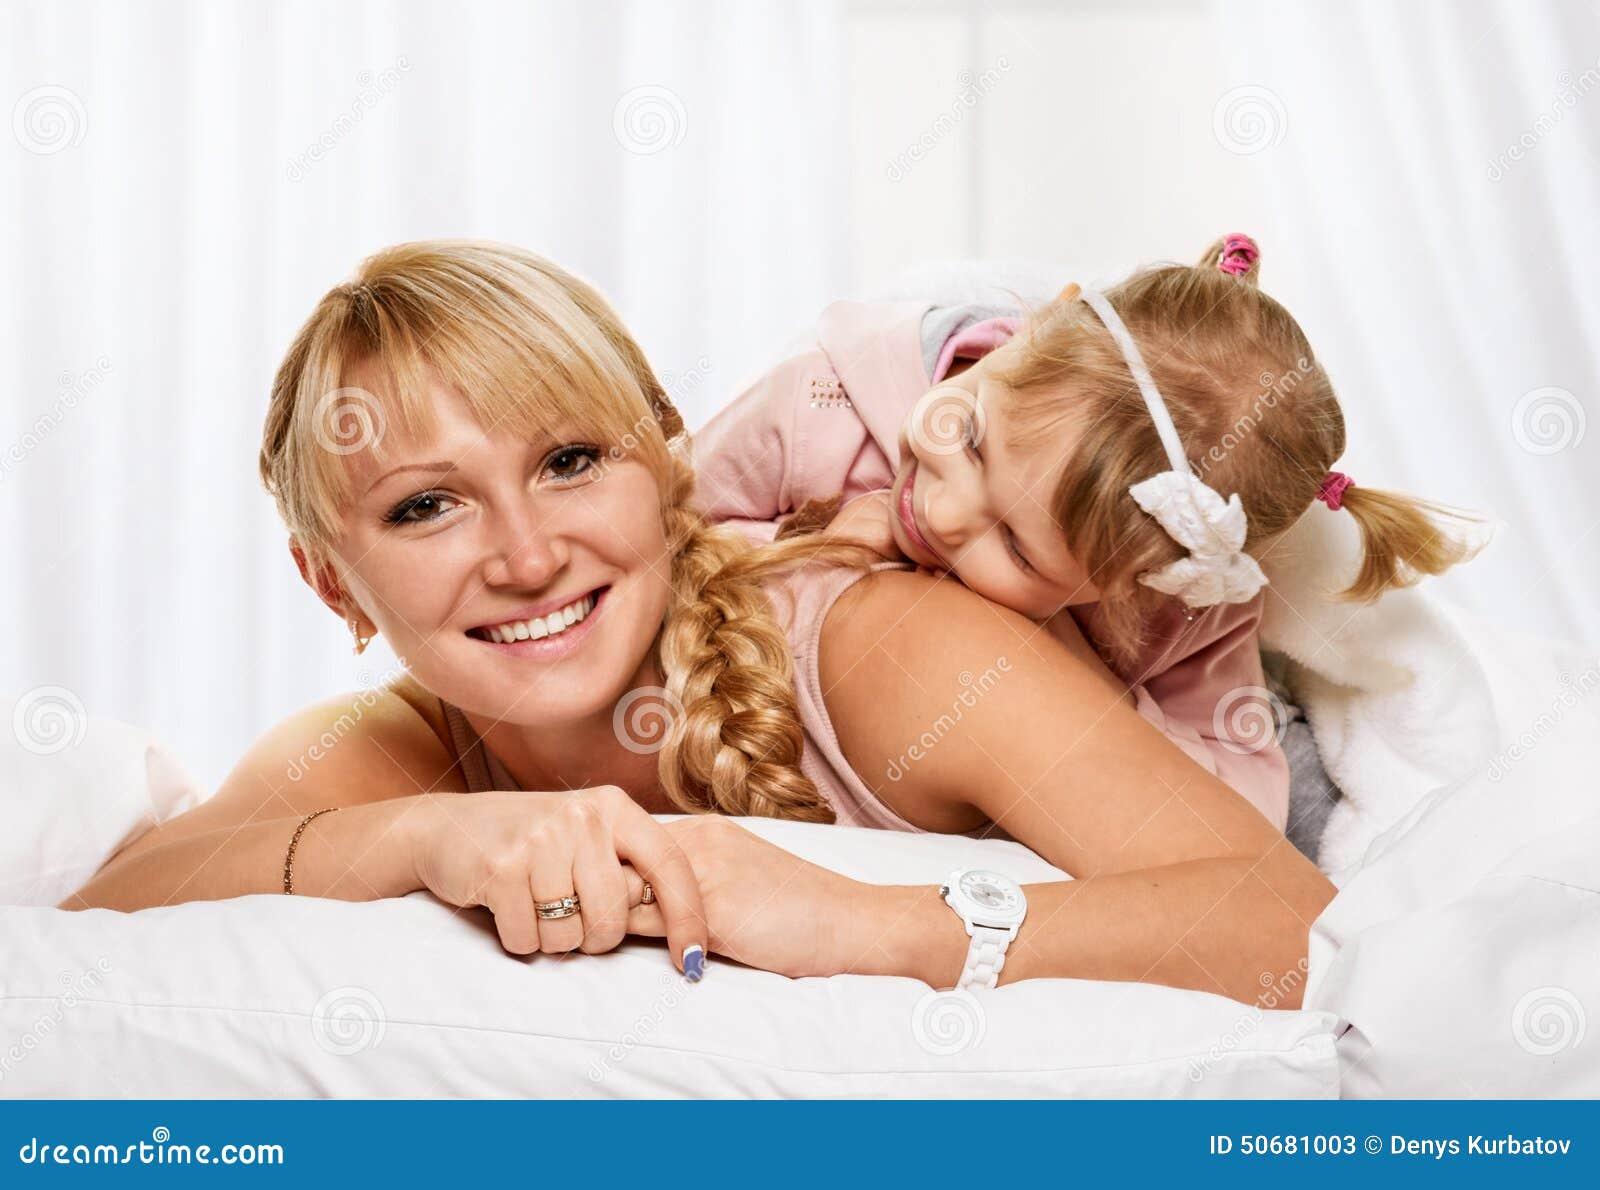 Download 母亲和女儿 库存图片. 图片 包括有 人们, 孩子, 女儿, 父项, 富感情的, 愉快, 白天, 子项, bedaub - 50681003